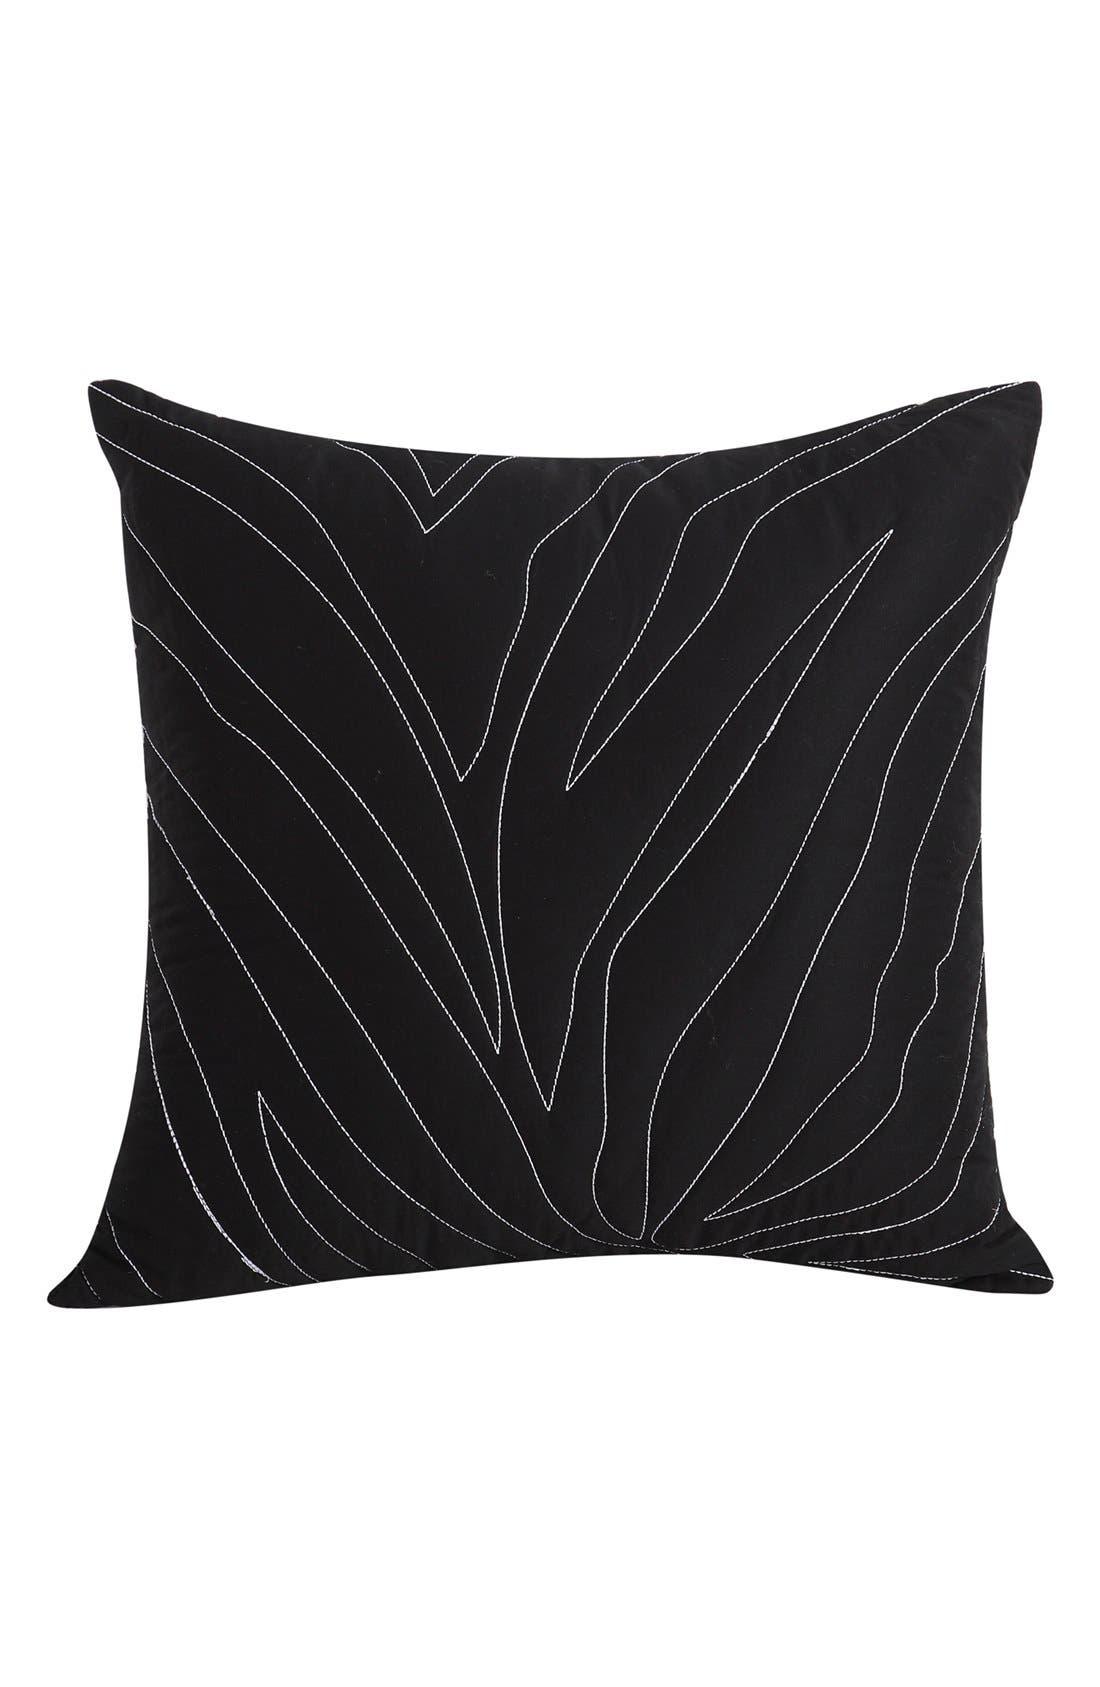 kensie 'Kara' Pillow